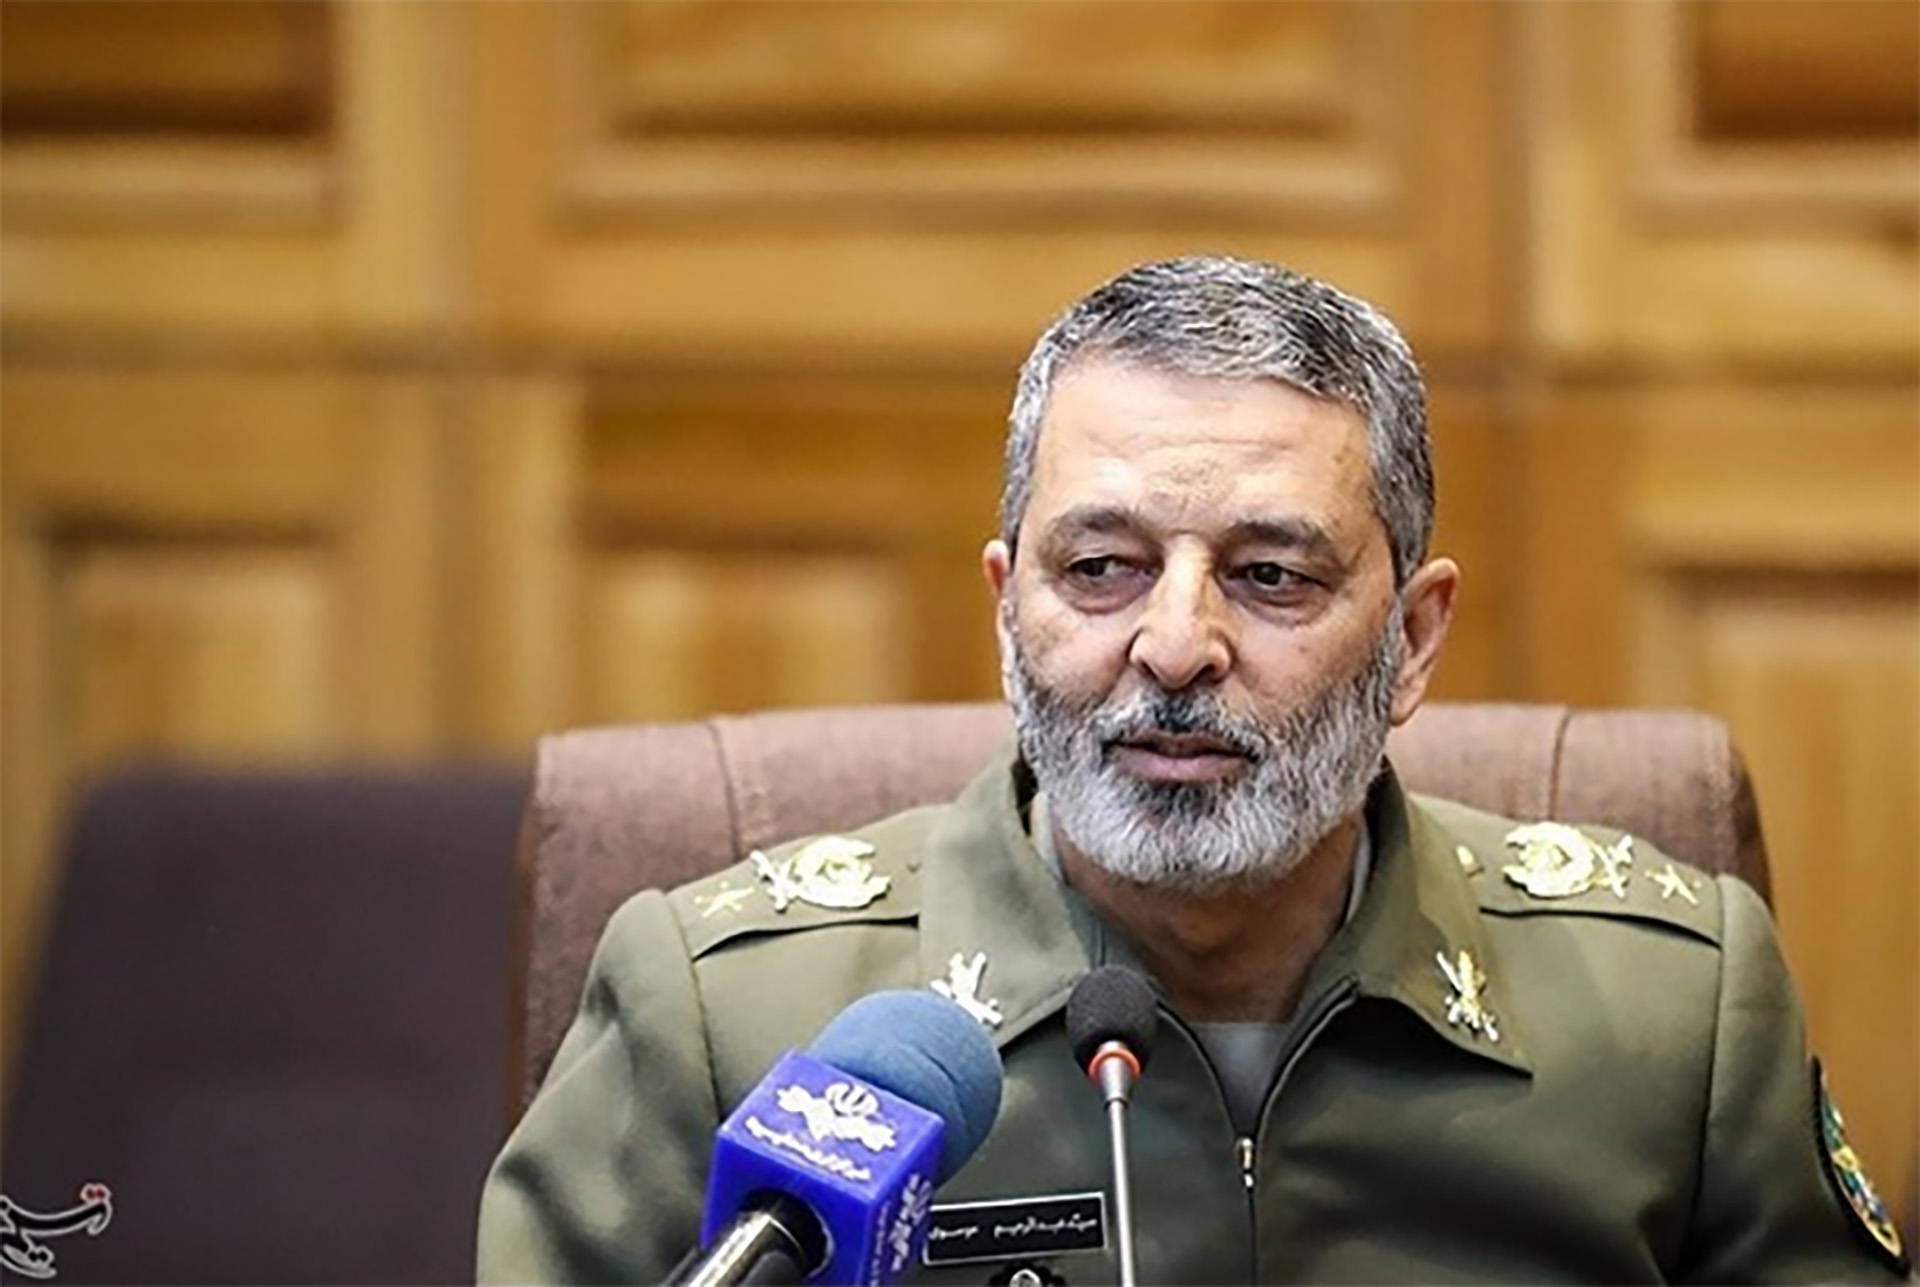 Abdolrahim Mousavi, jefe del ejército iraní (Tasnim)